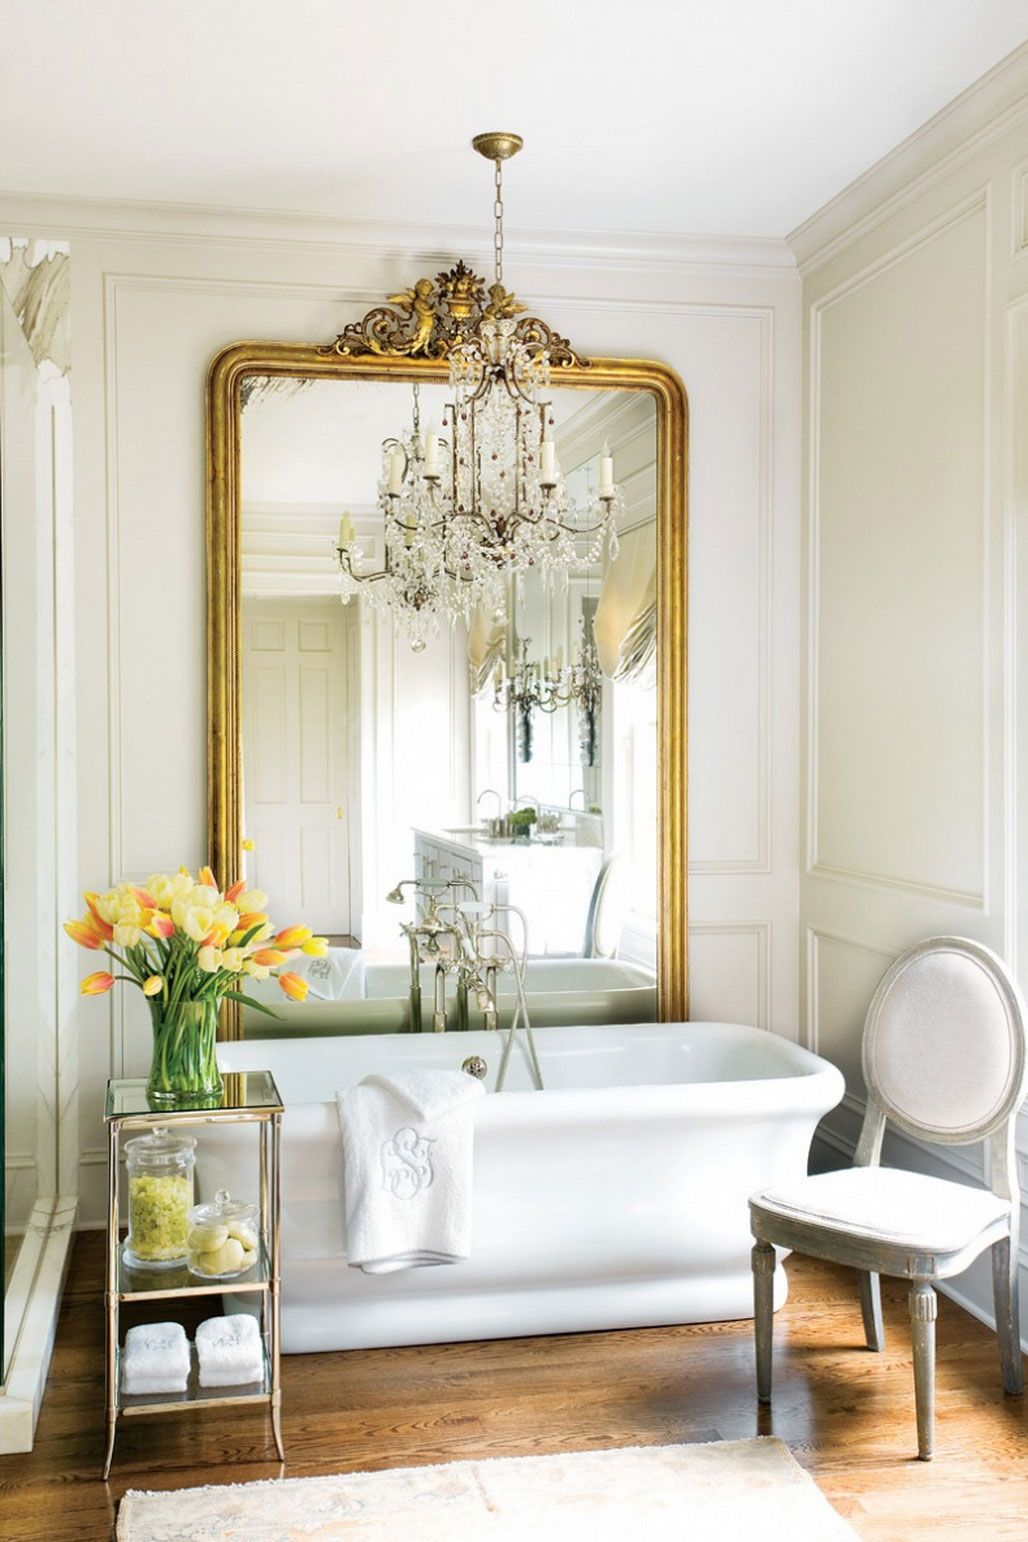 Decorations Elegant Spring Bahtrom Decor Ideas With Golden Decorative Frame Mirror Fancy White